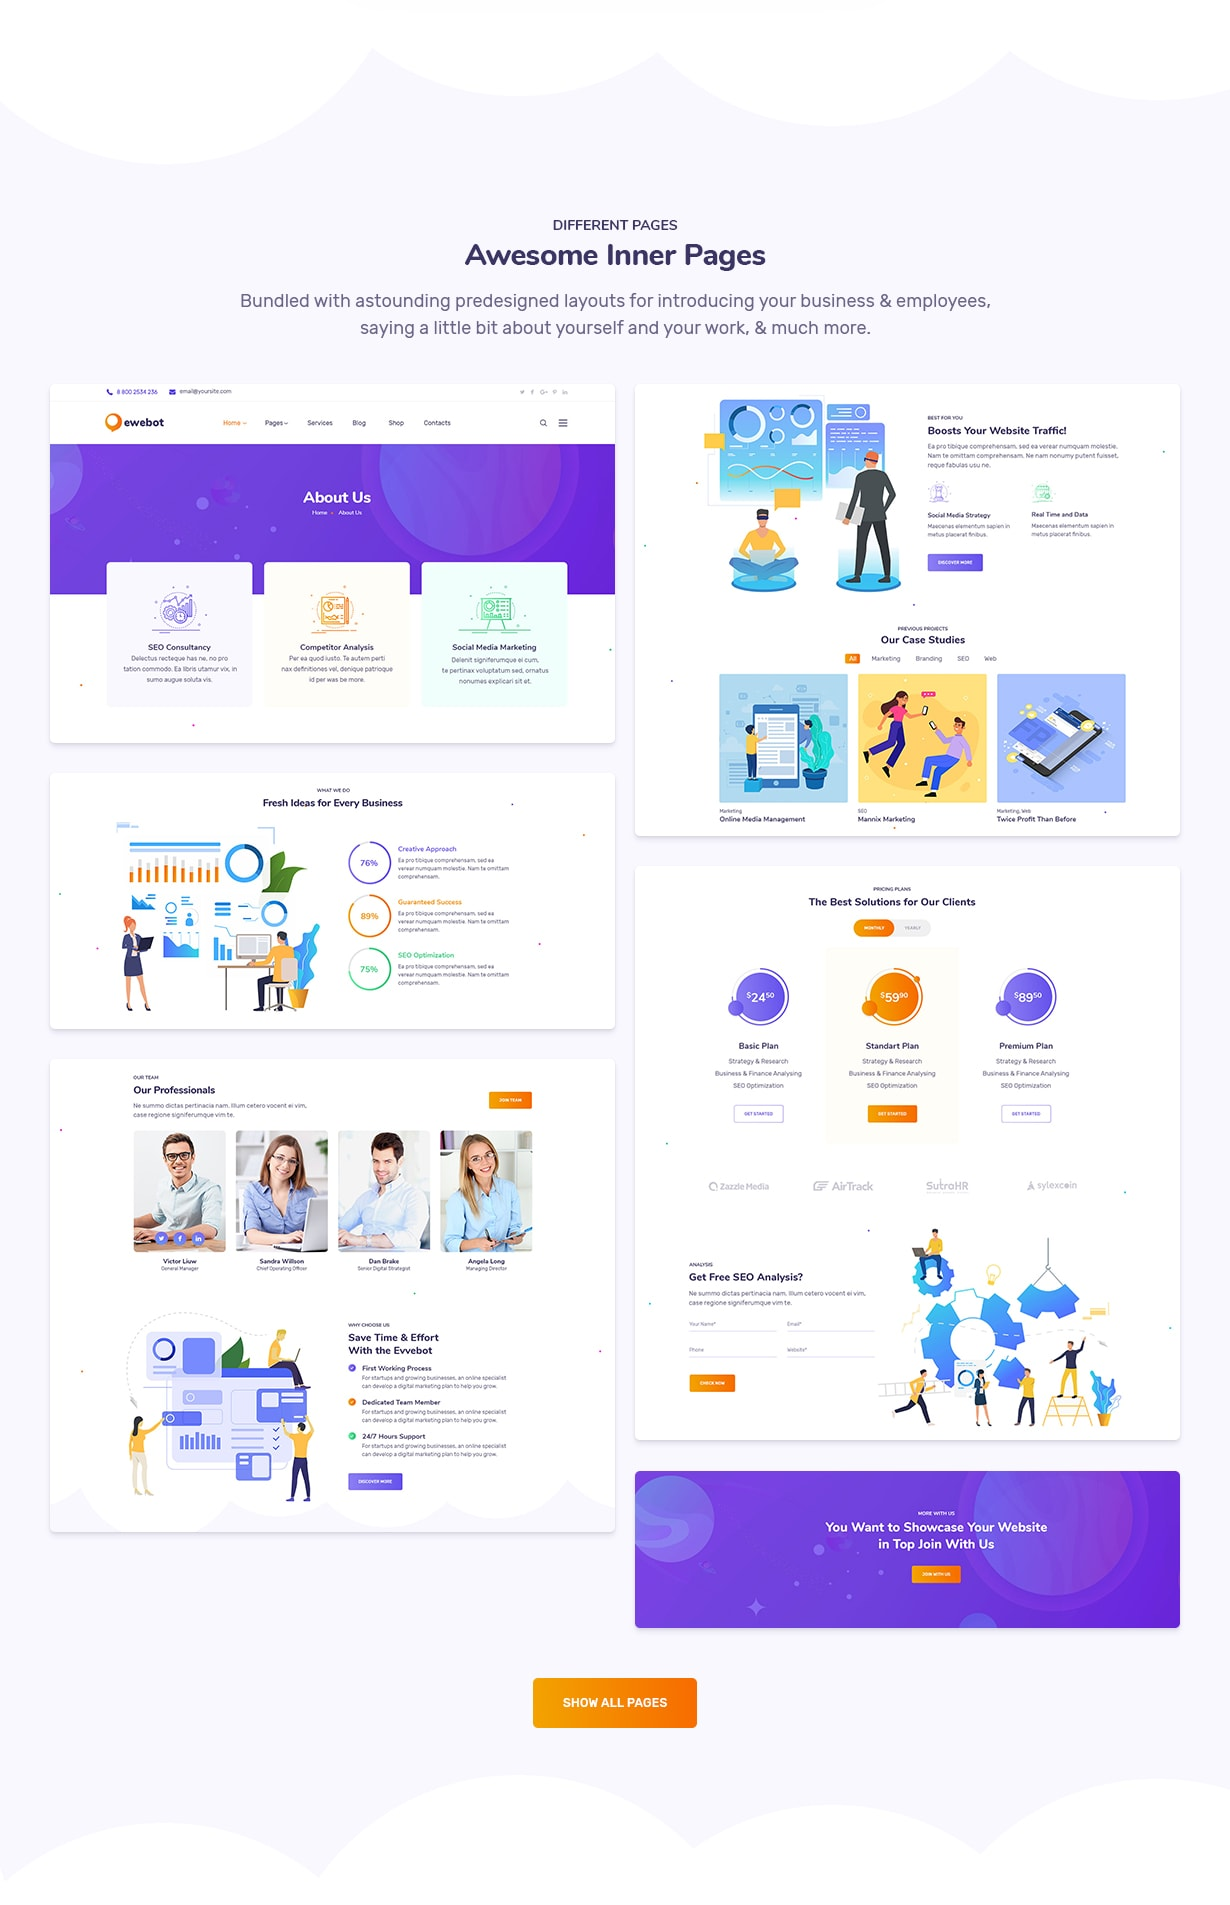 ewebot wp2 - Ewebot - SEO Marketing & Digital Agency